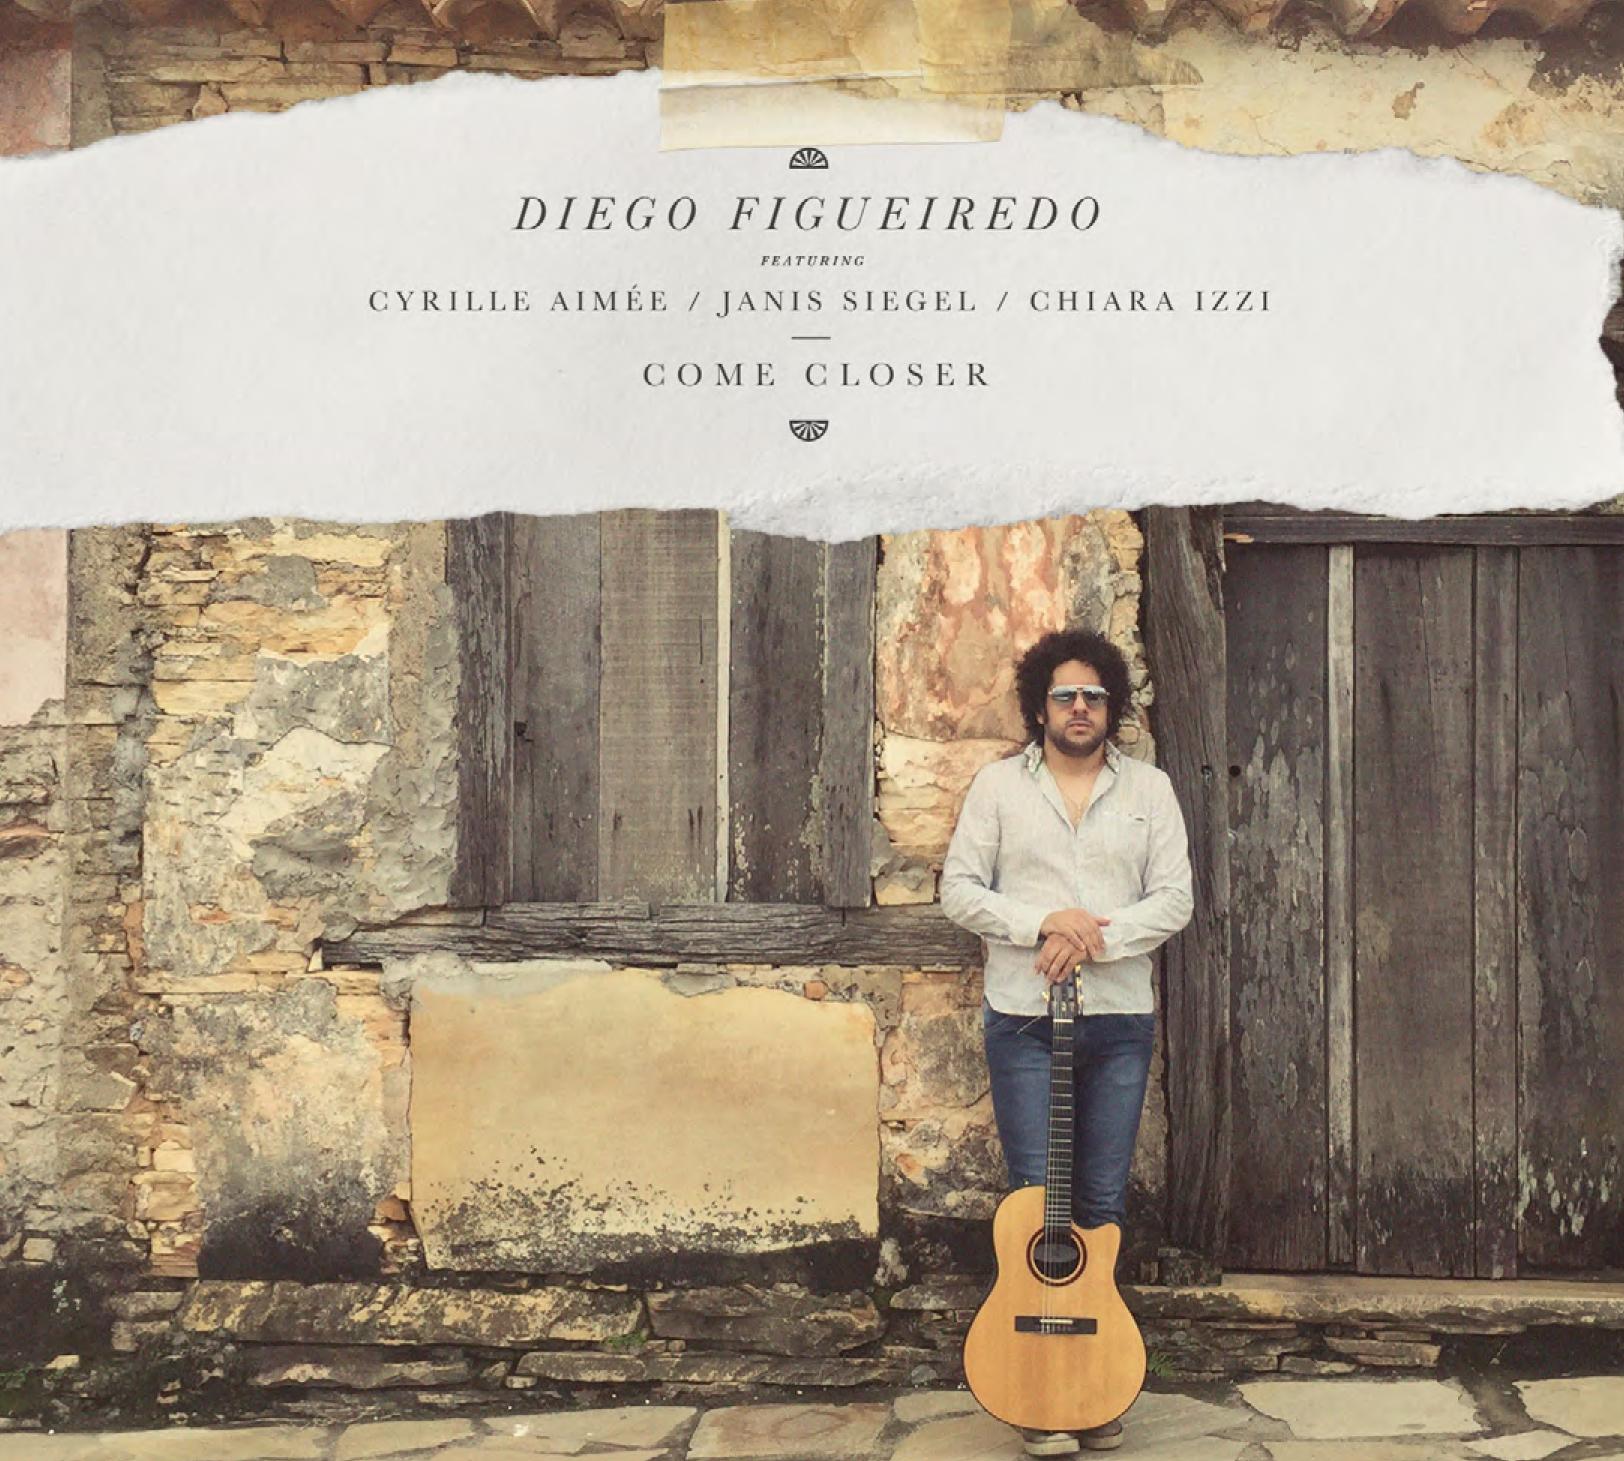 DIEGO FIGUEIREDO - Come Closer cover